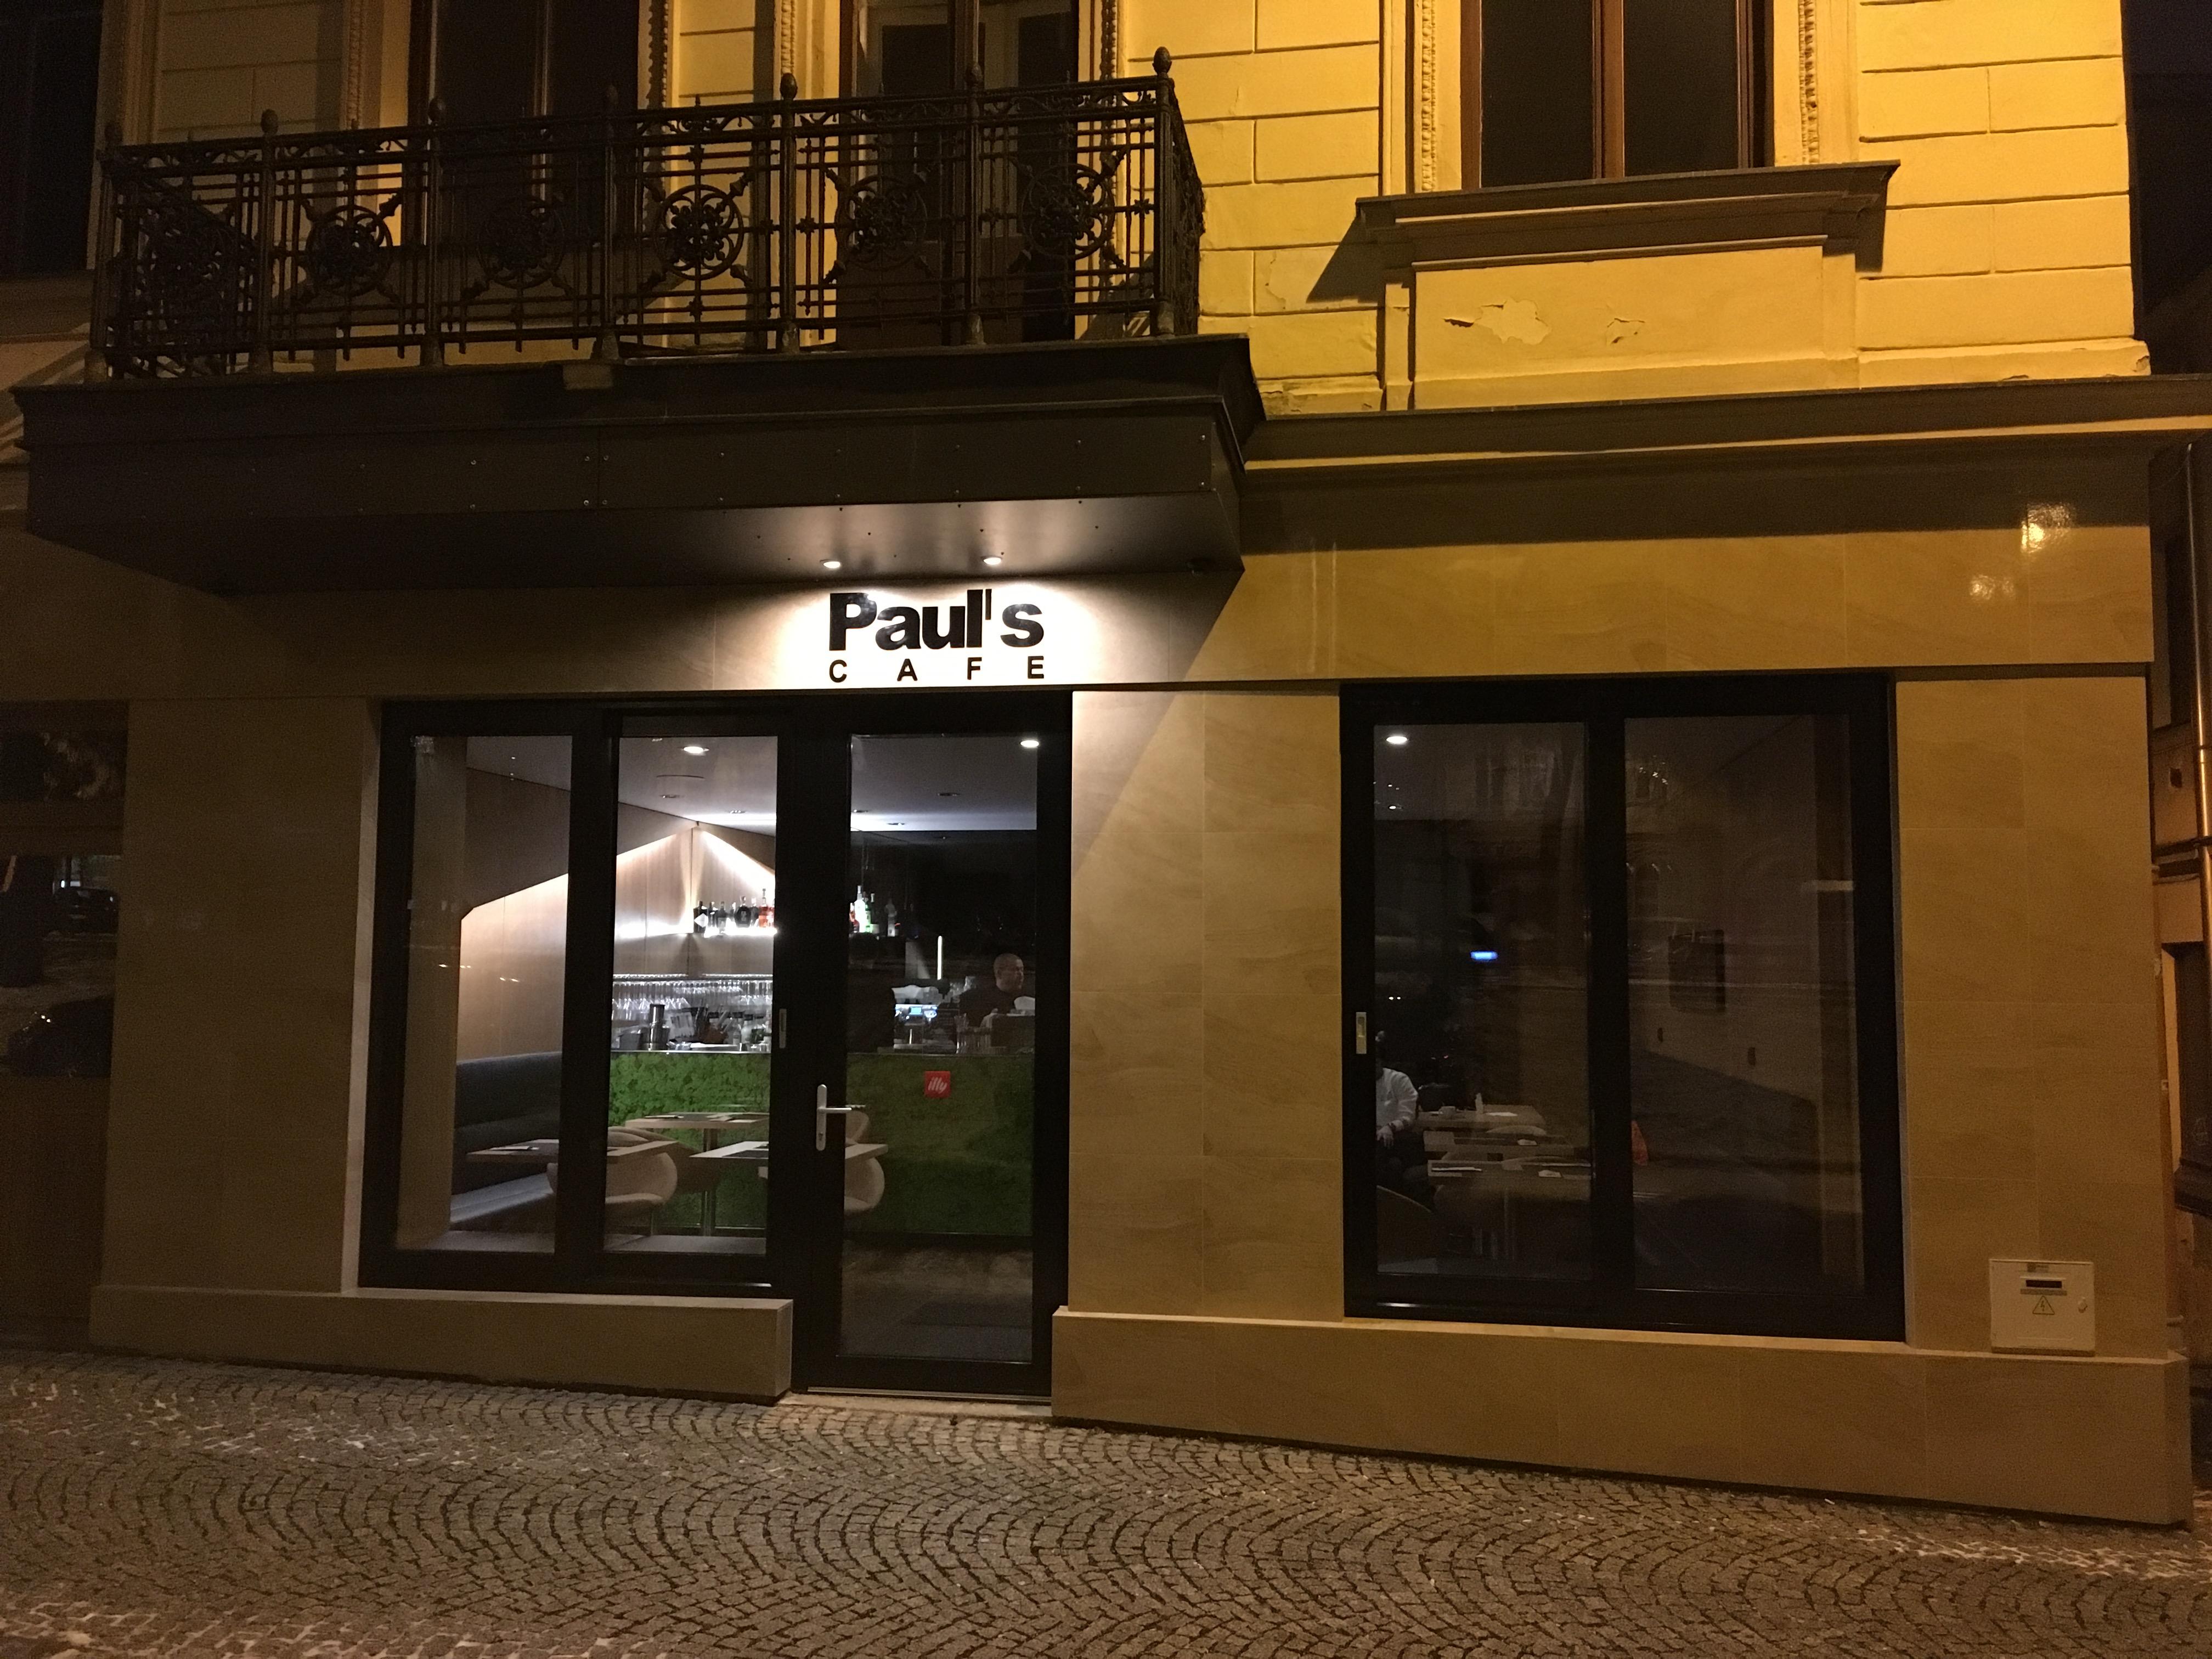 005_PAULS_CAFÉ.JPG